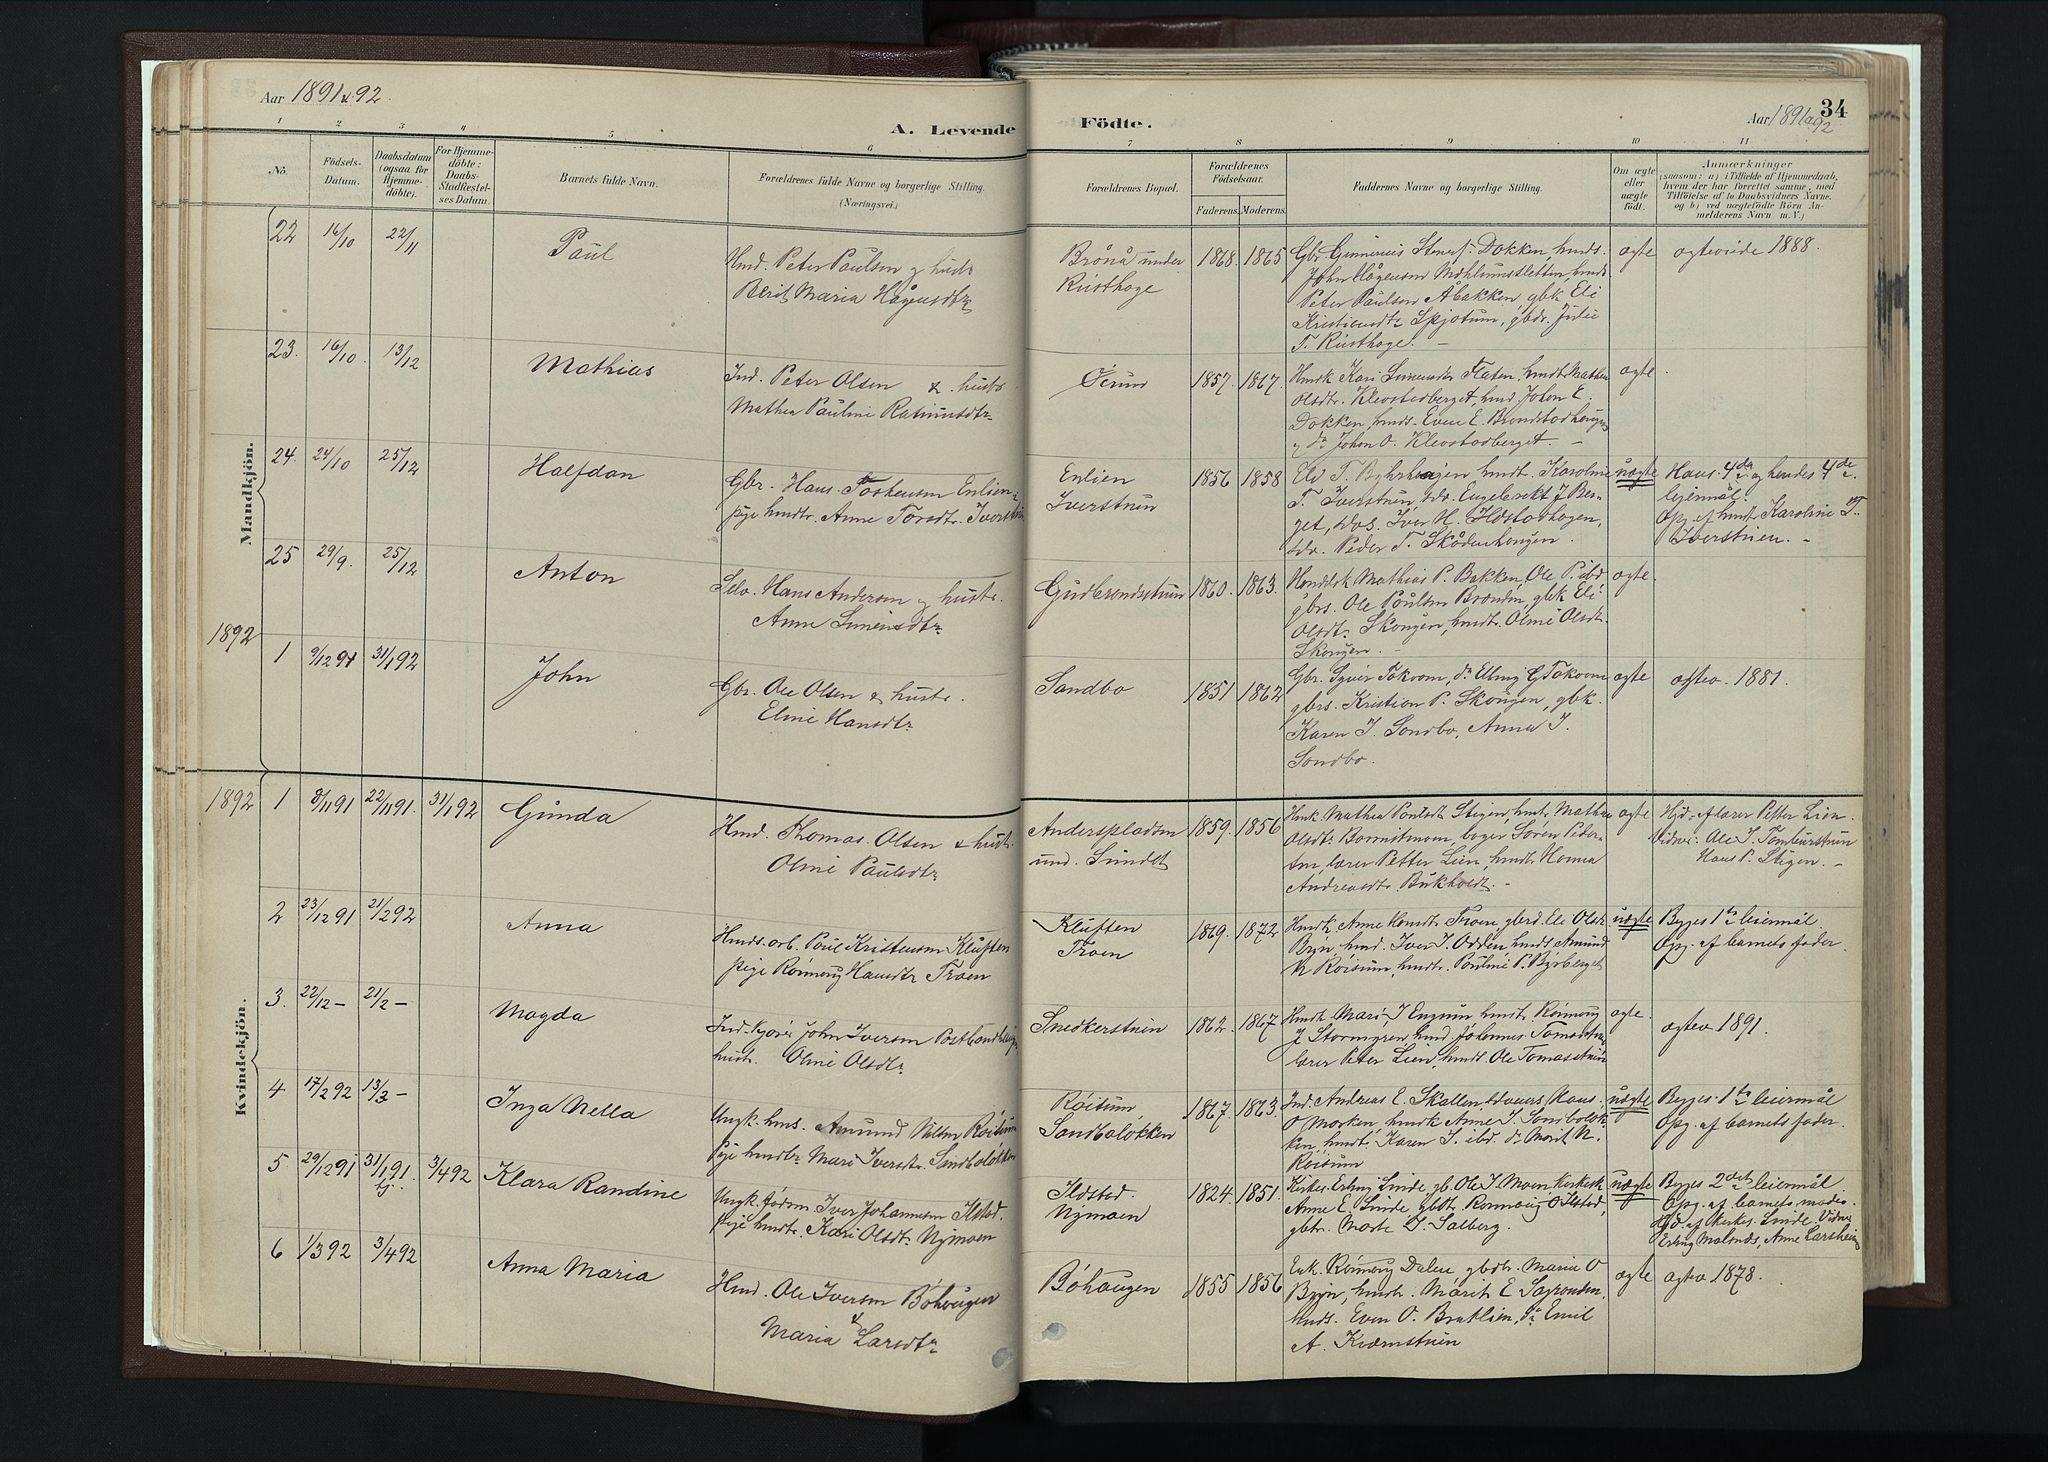 SAH, Nord-Fron prestekontor, Ministerialbok nr. 4, 1884-1914, s. 34